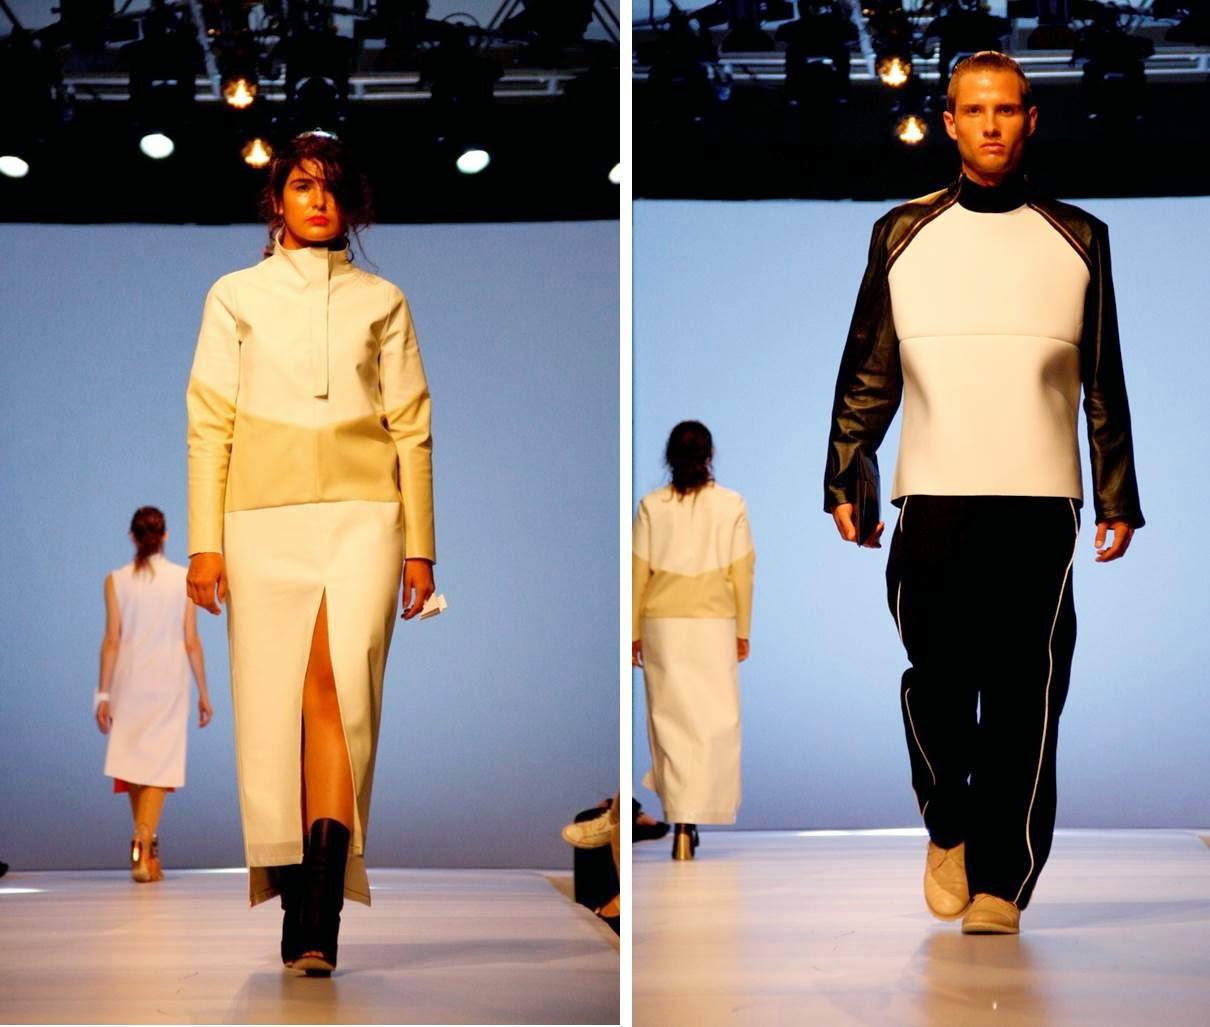 SAPICA Agosto 2014, Mexico es Moda, Lab 1, Jannette Klein, Prospectamoda, Pasarela, Diseño Mexicano.